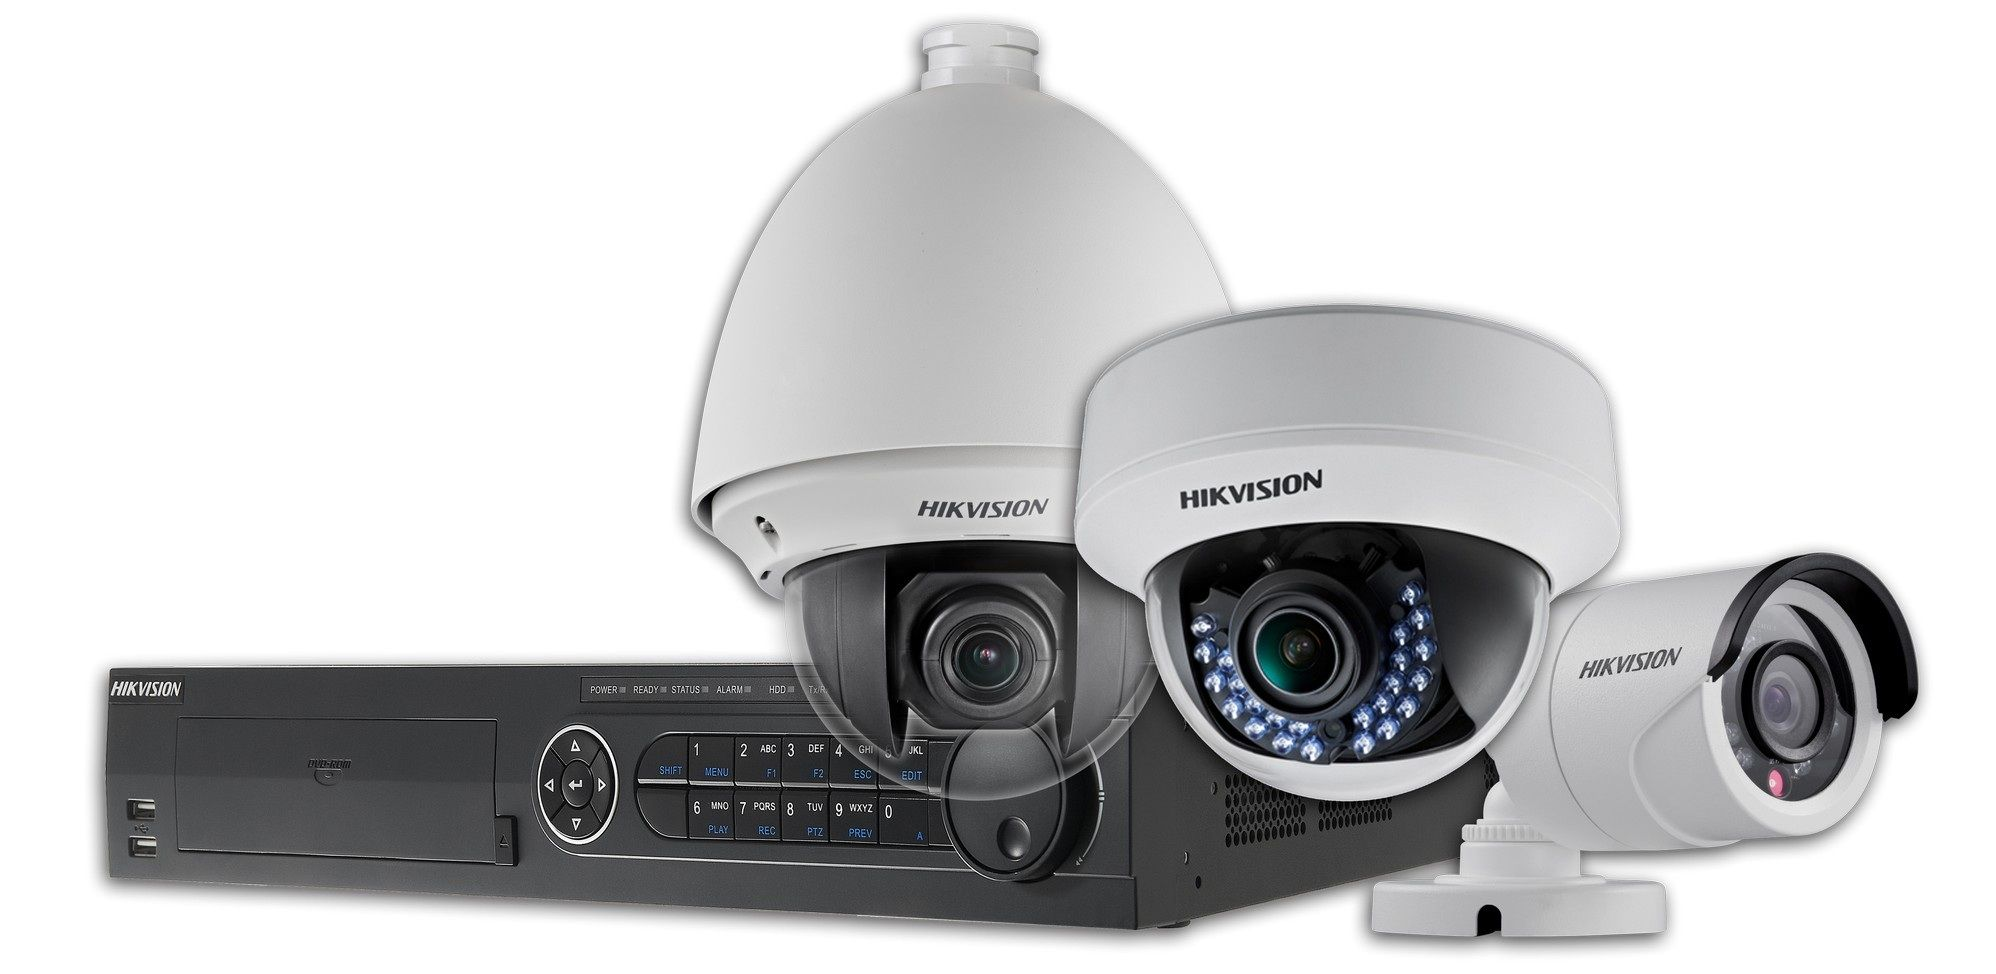 Rejestrator HD-TVI i kamery HD-TVI (obrotowa, sufitowa, kompaktowa)